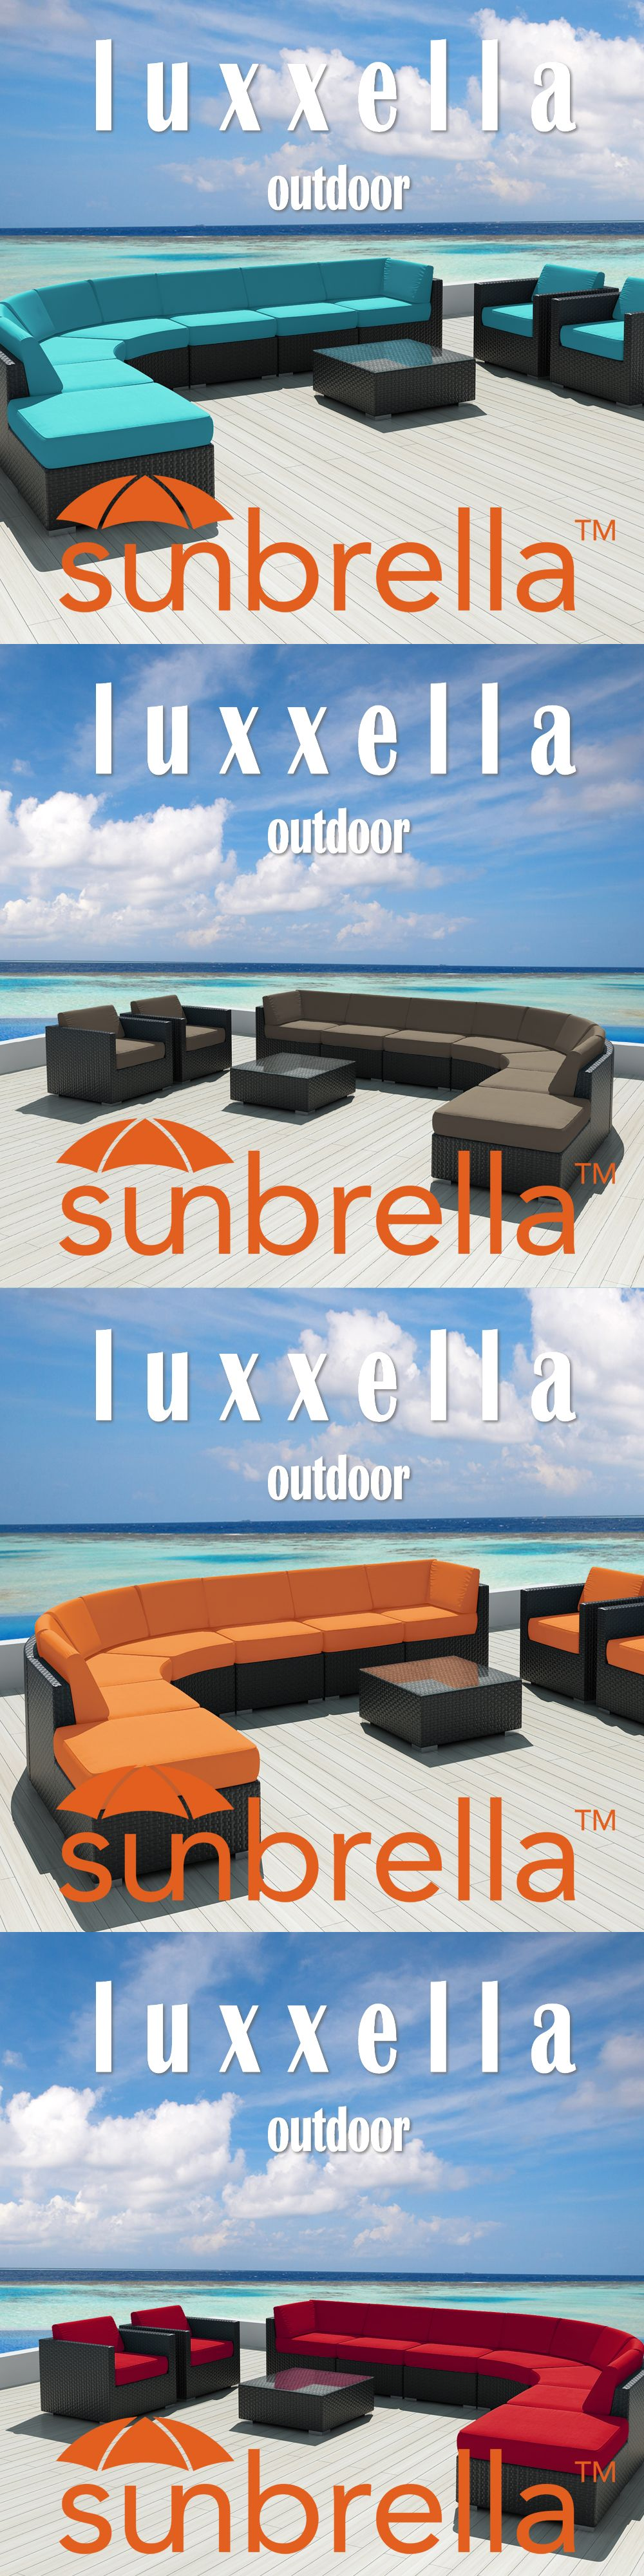 Luxxella Outdoor Wicker Furniture set | Wicker Furniture | Pinterest ...